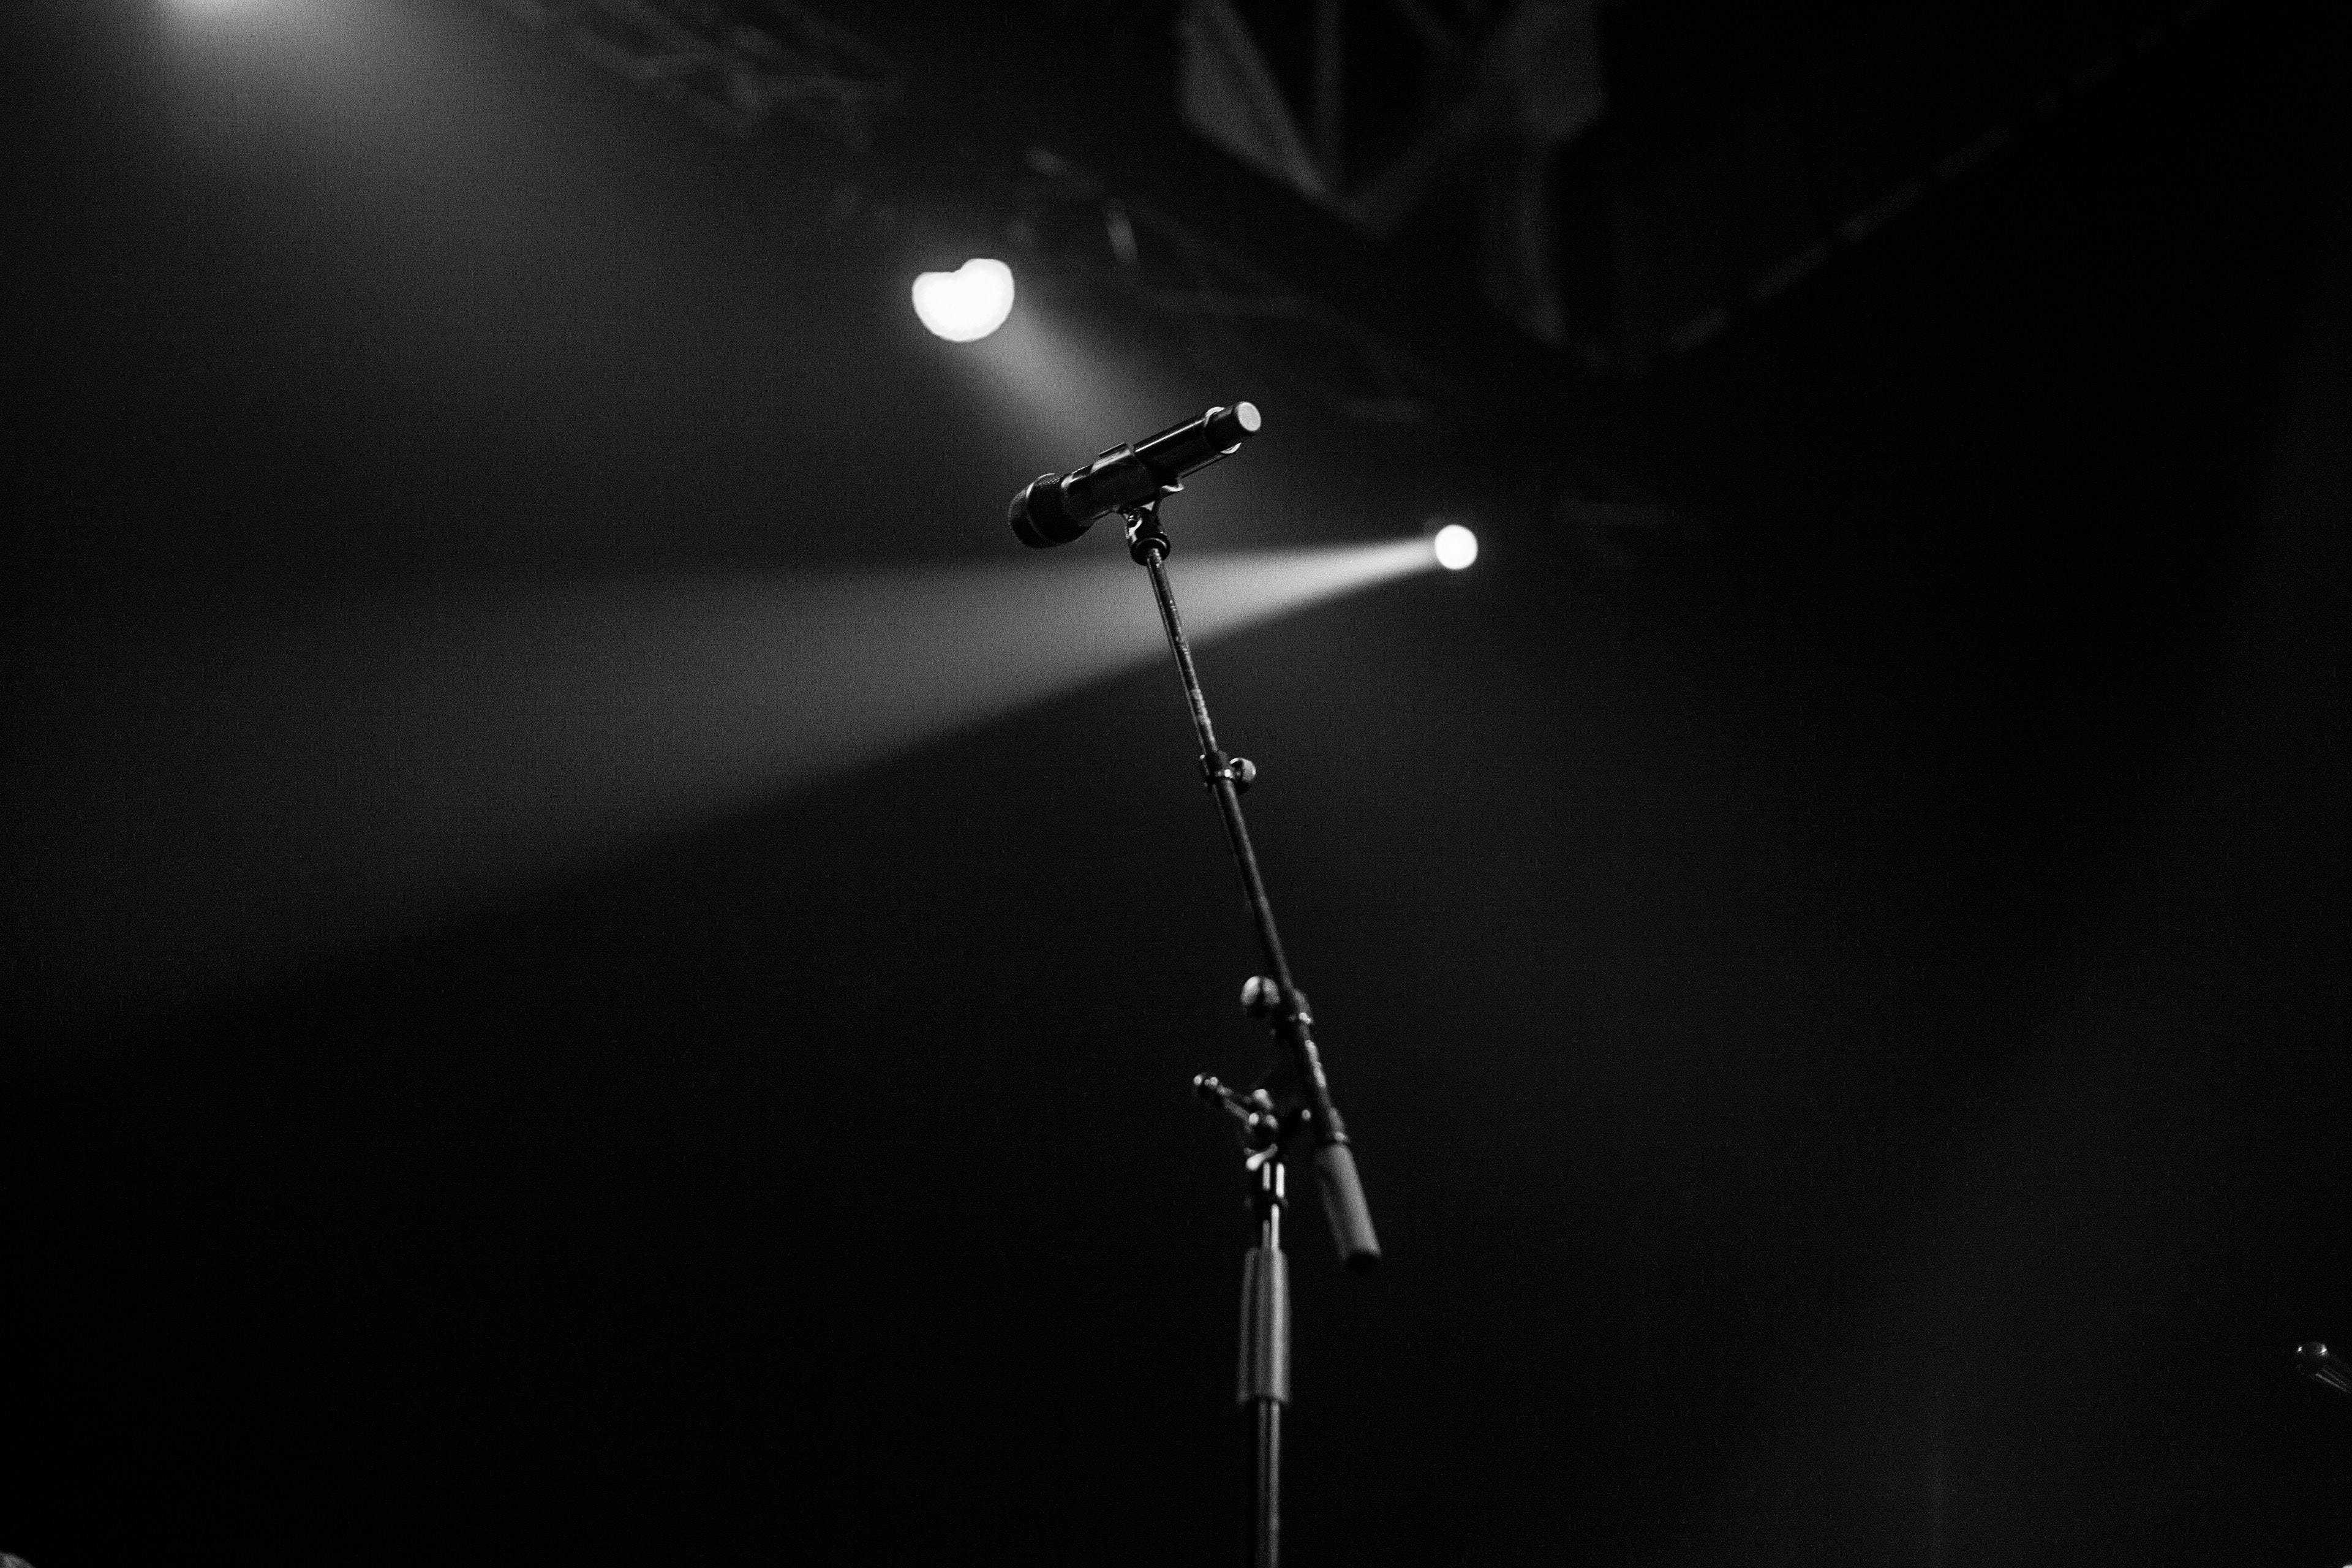 mic, lights, stage